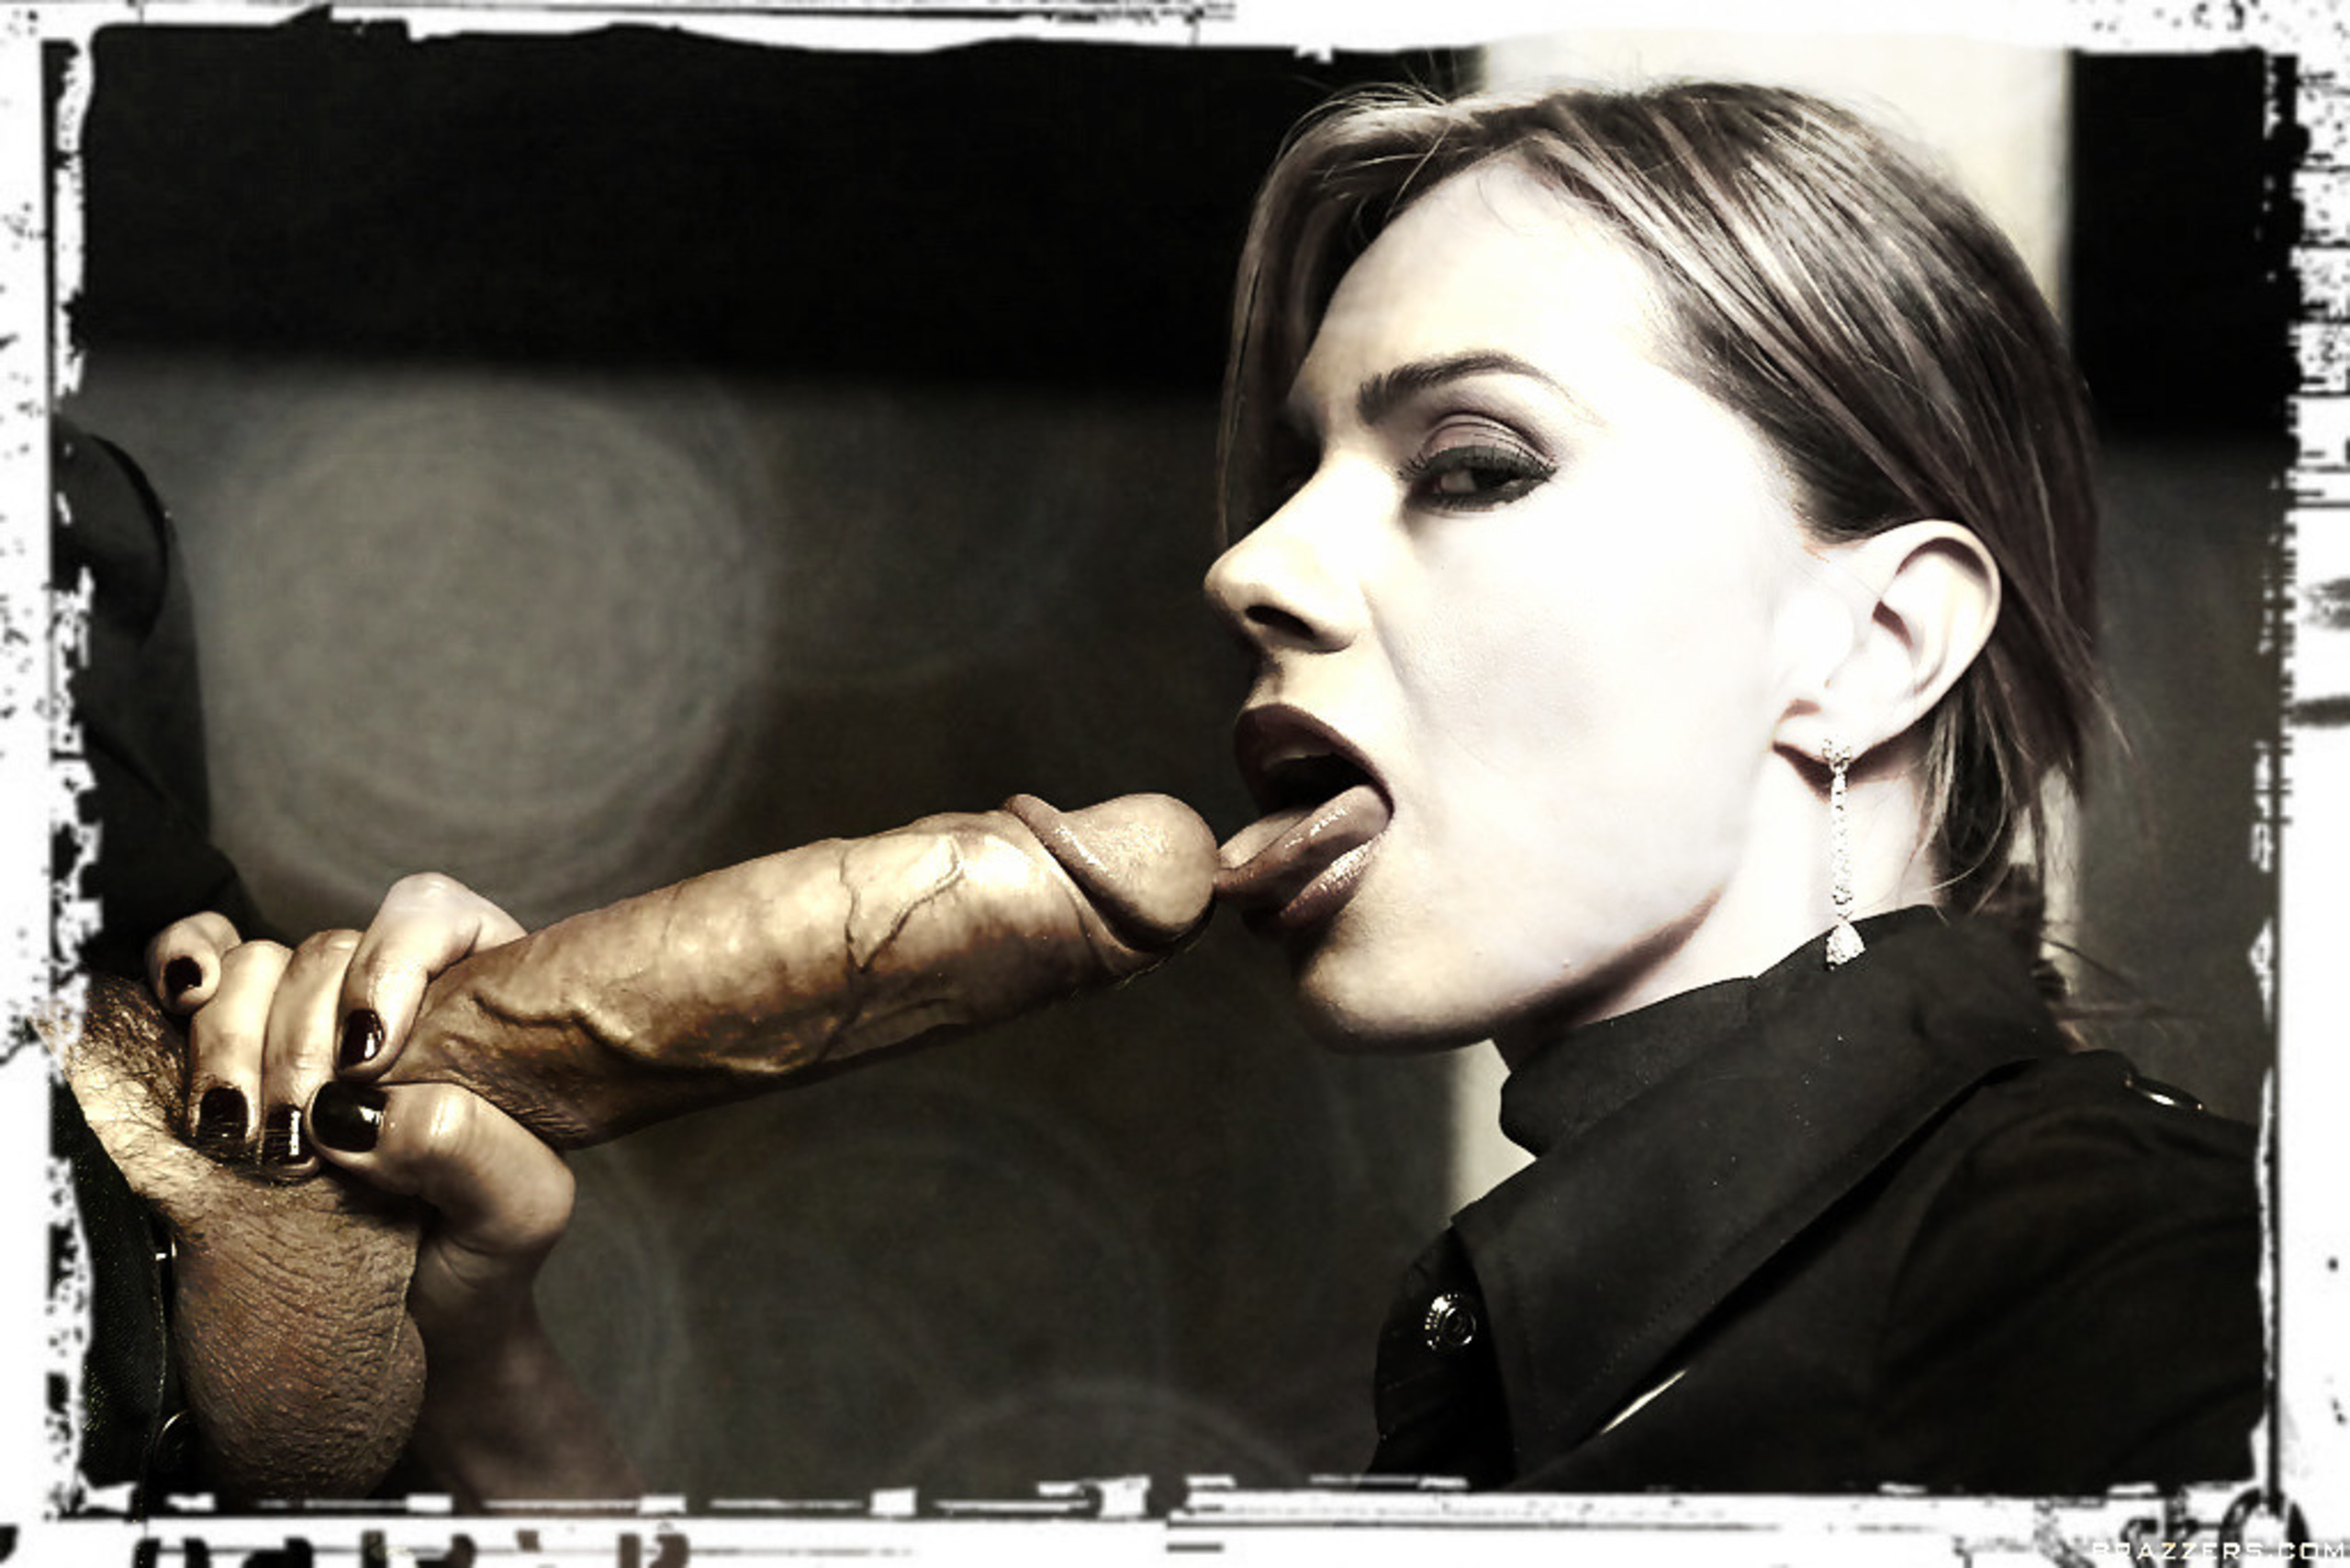 Big dick erotic art blowjob